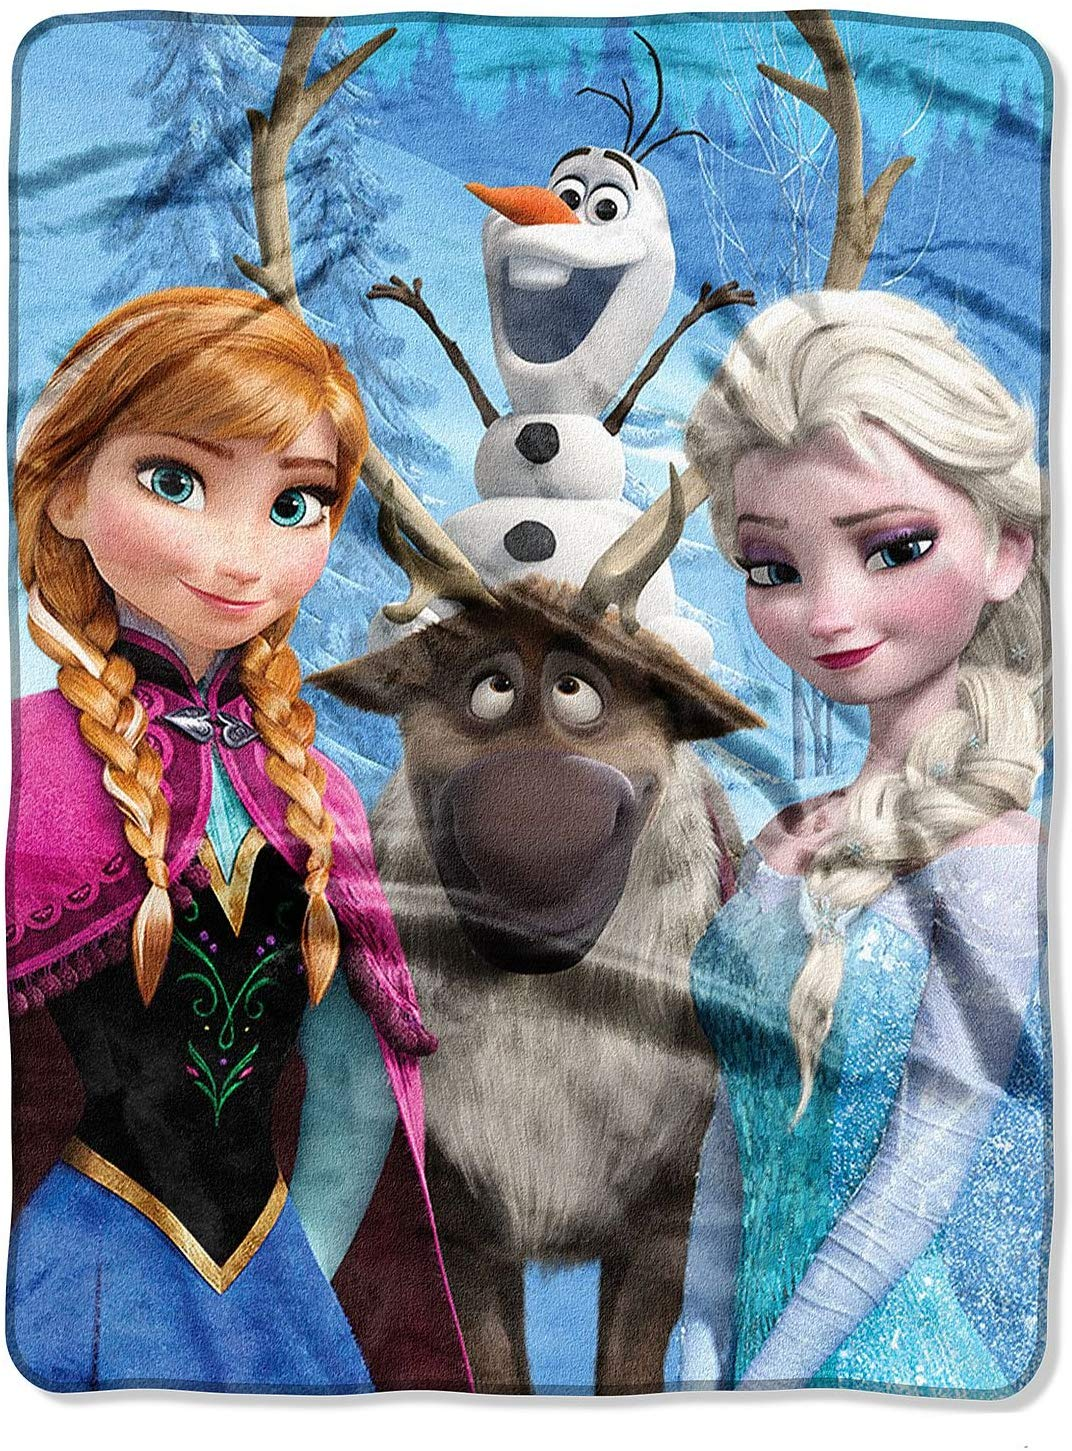 Disney Frozen 2 Kids Silk Fleece Throw Blanket - frozen gift ideas